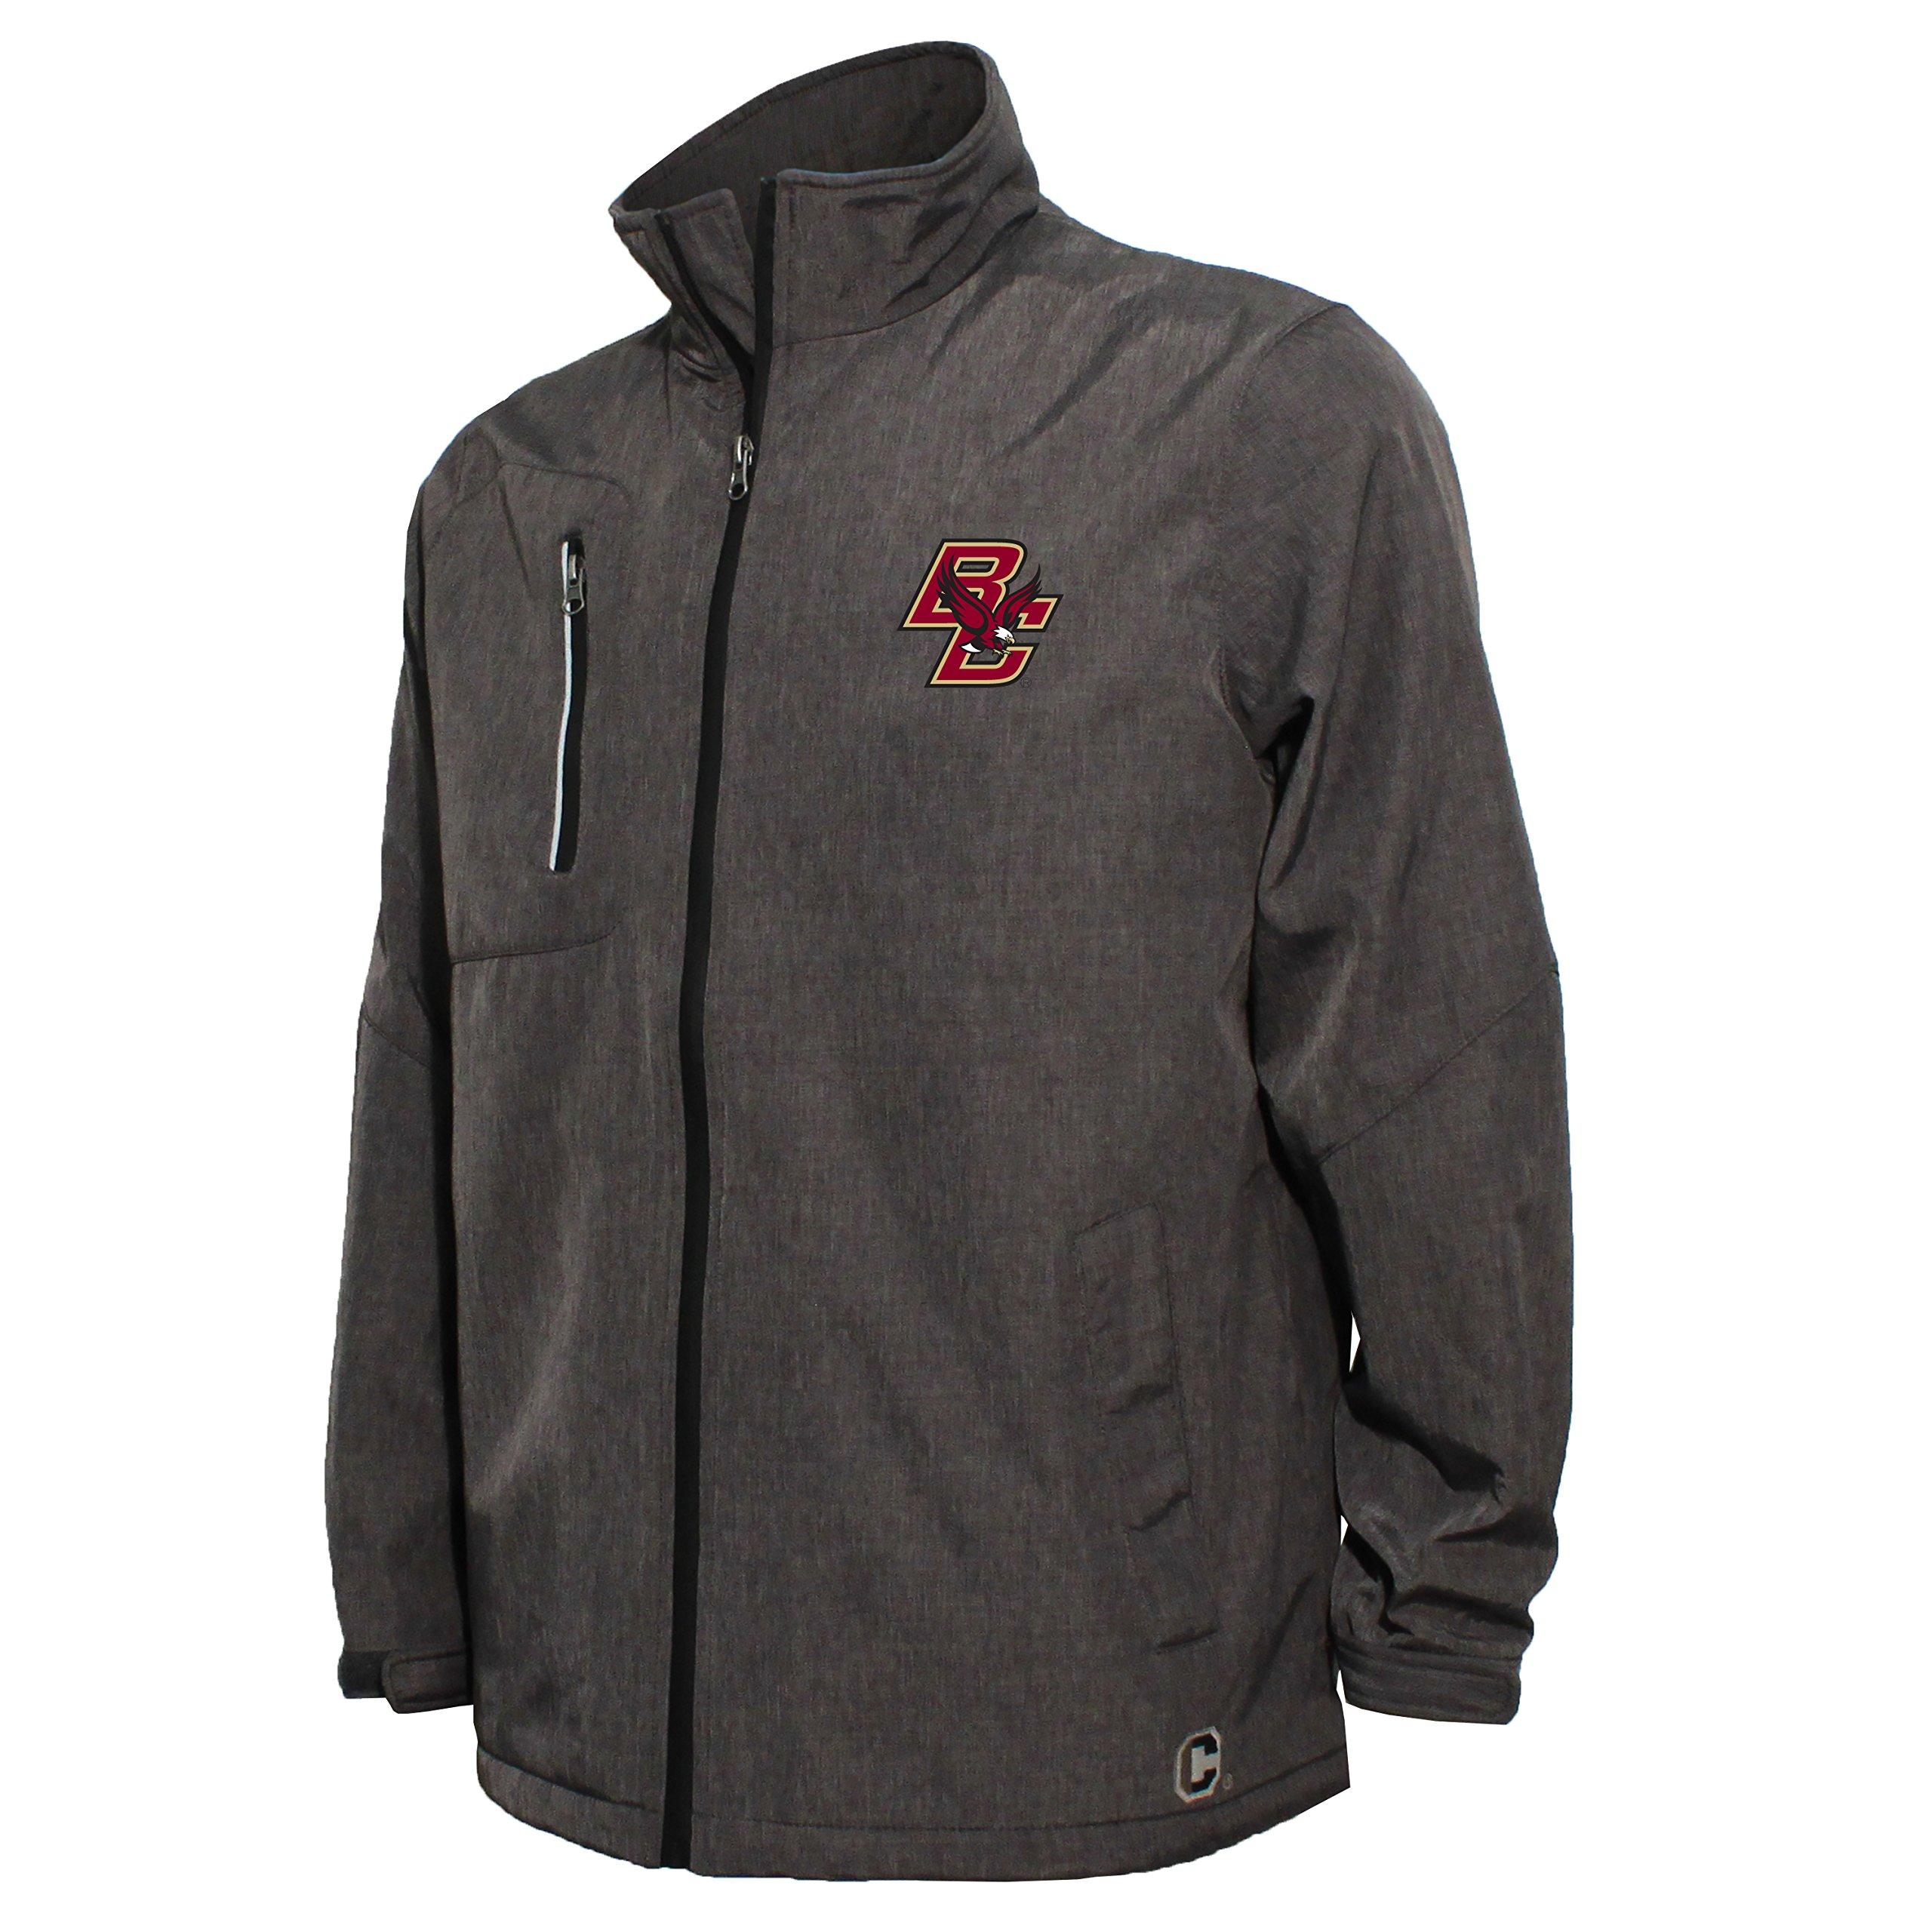 NCAA Boston College Eagles Men's Bonded Stand Up Collar Stadium Jacket, Large, Dark Gray